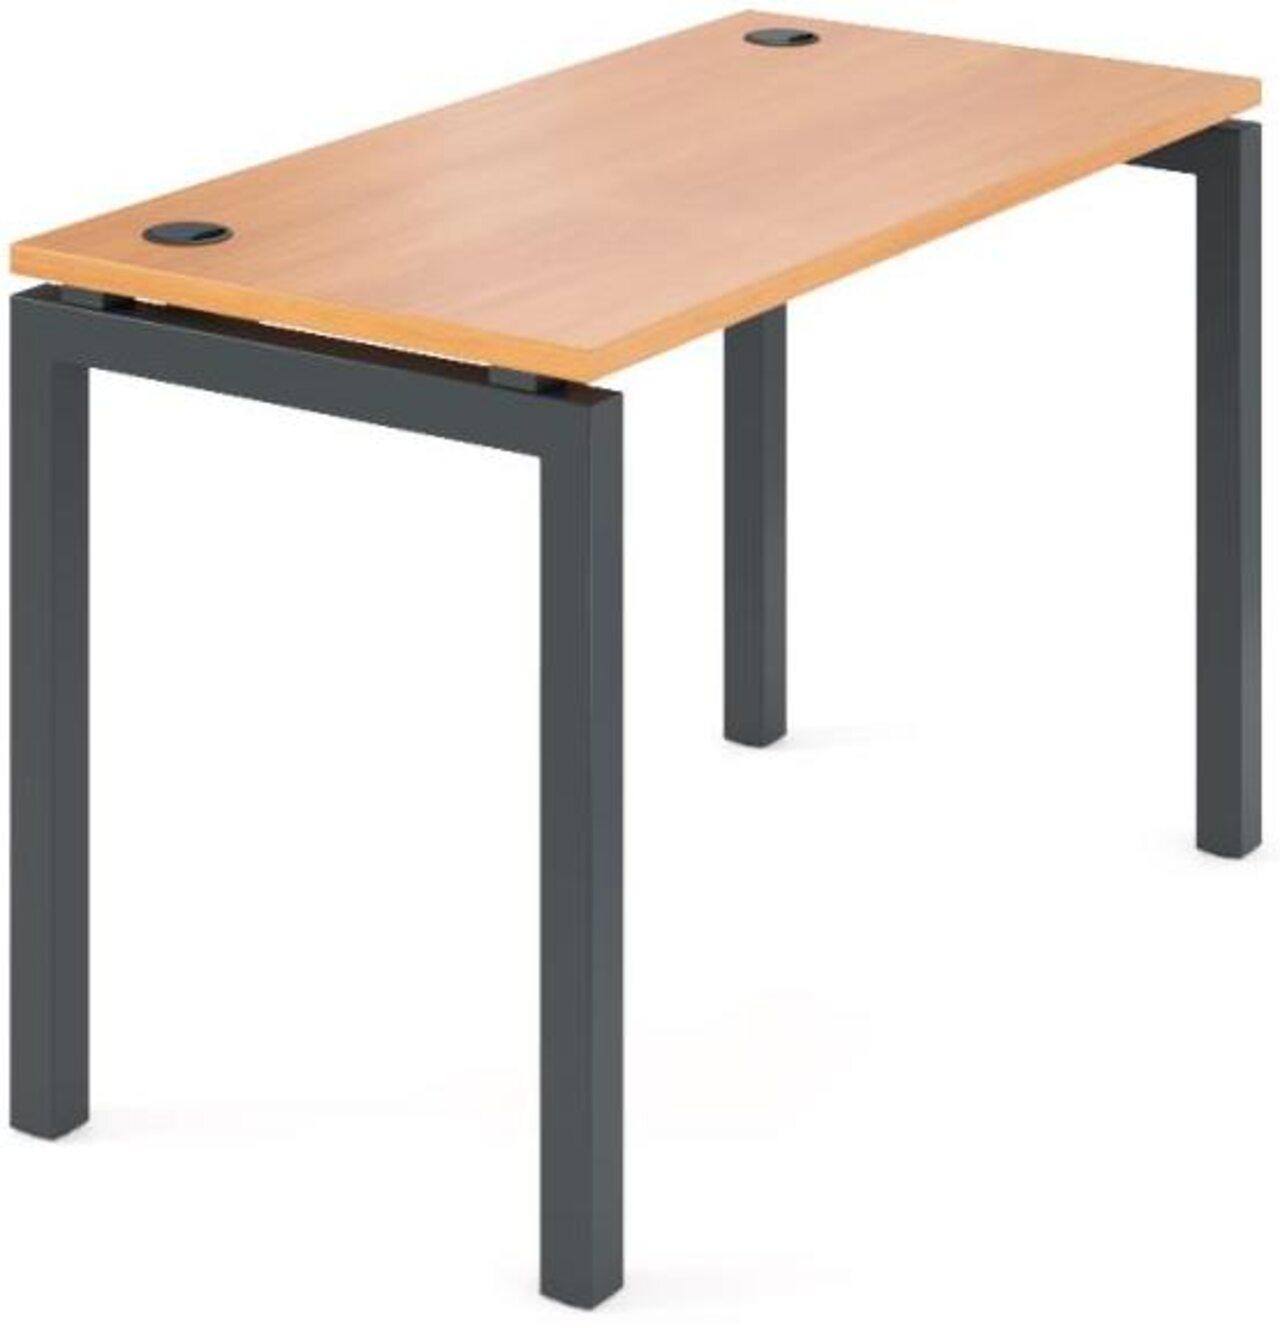 Стол на металлокаркасе  Арго 120x60x76 - фото 7